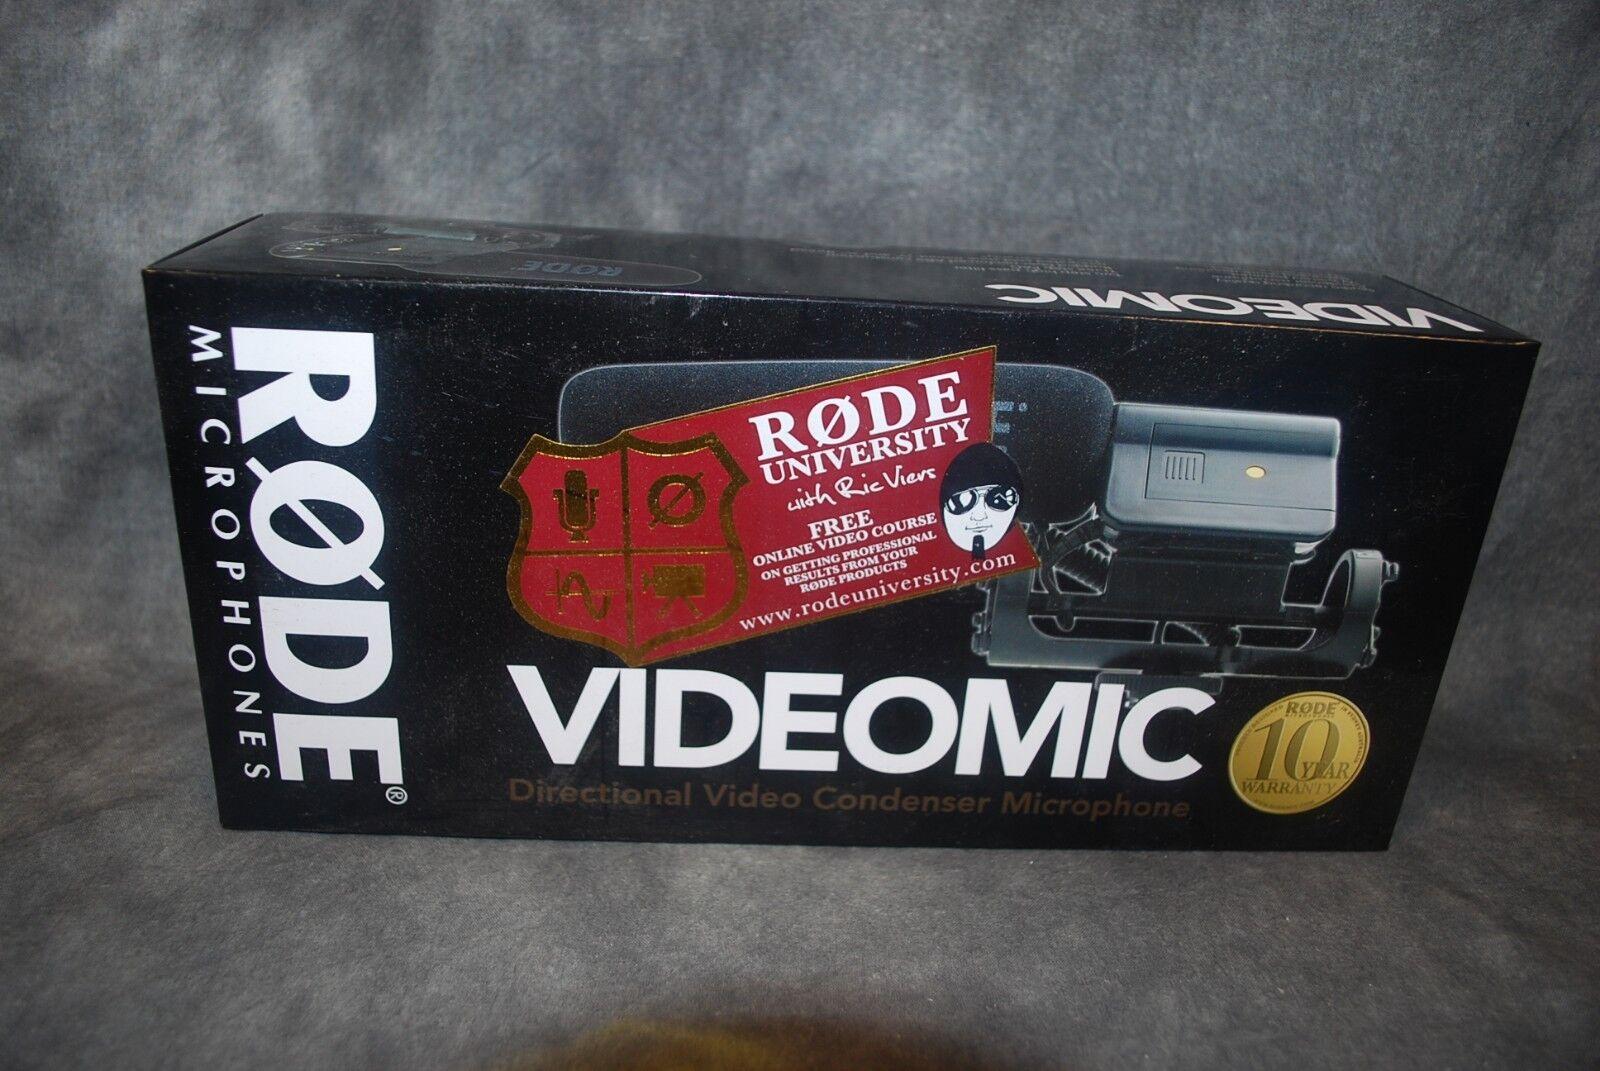 Rode Video Mic VideoMic New Dealer Microphone